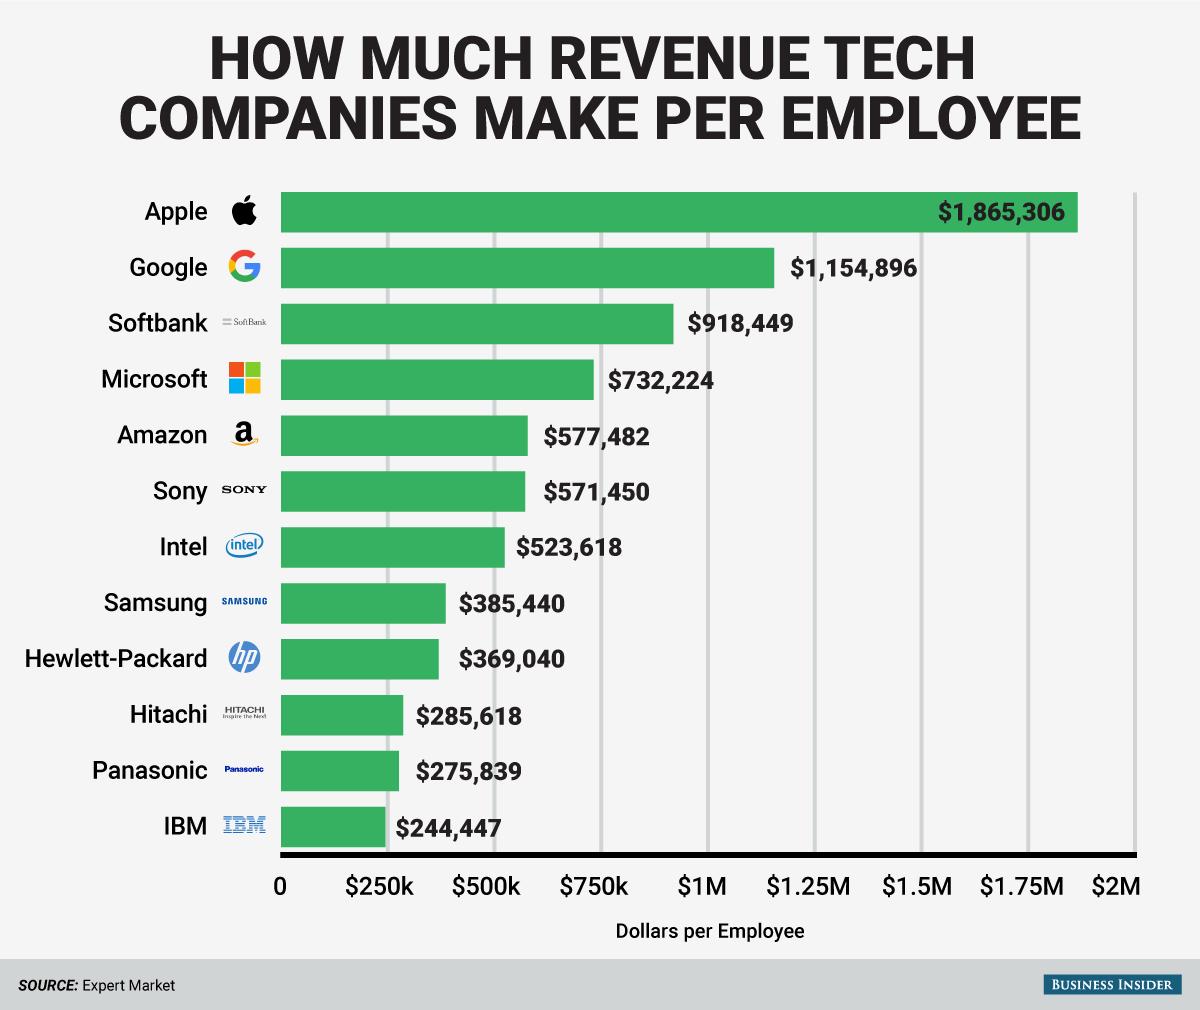 How much revenue tech companies make per employee... Beurs